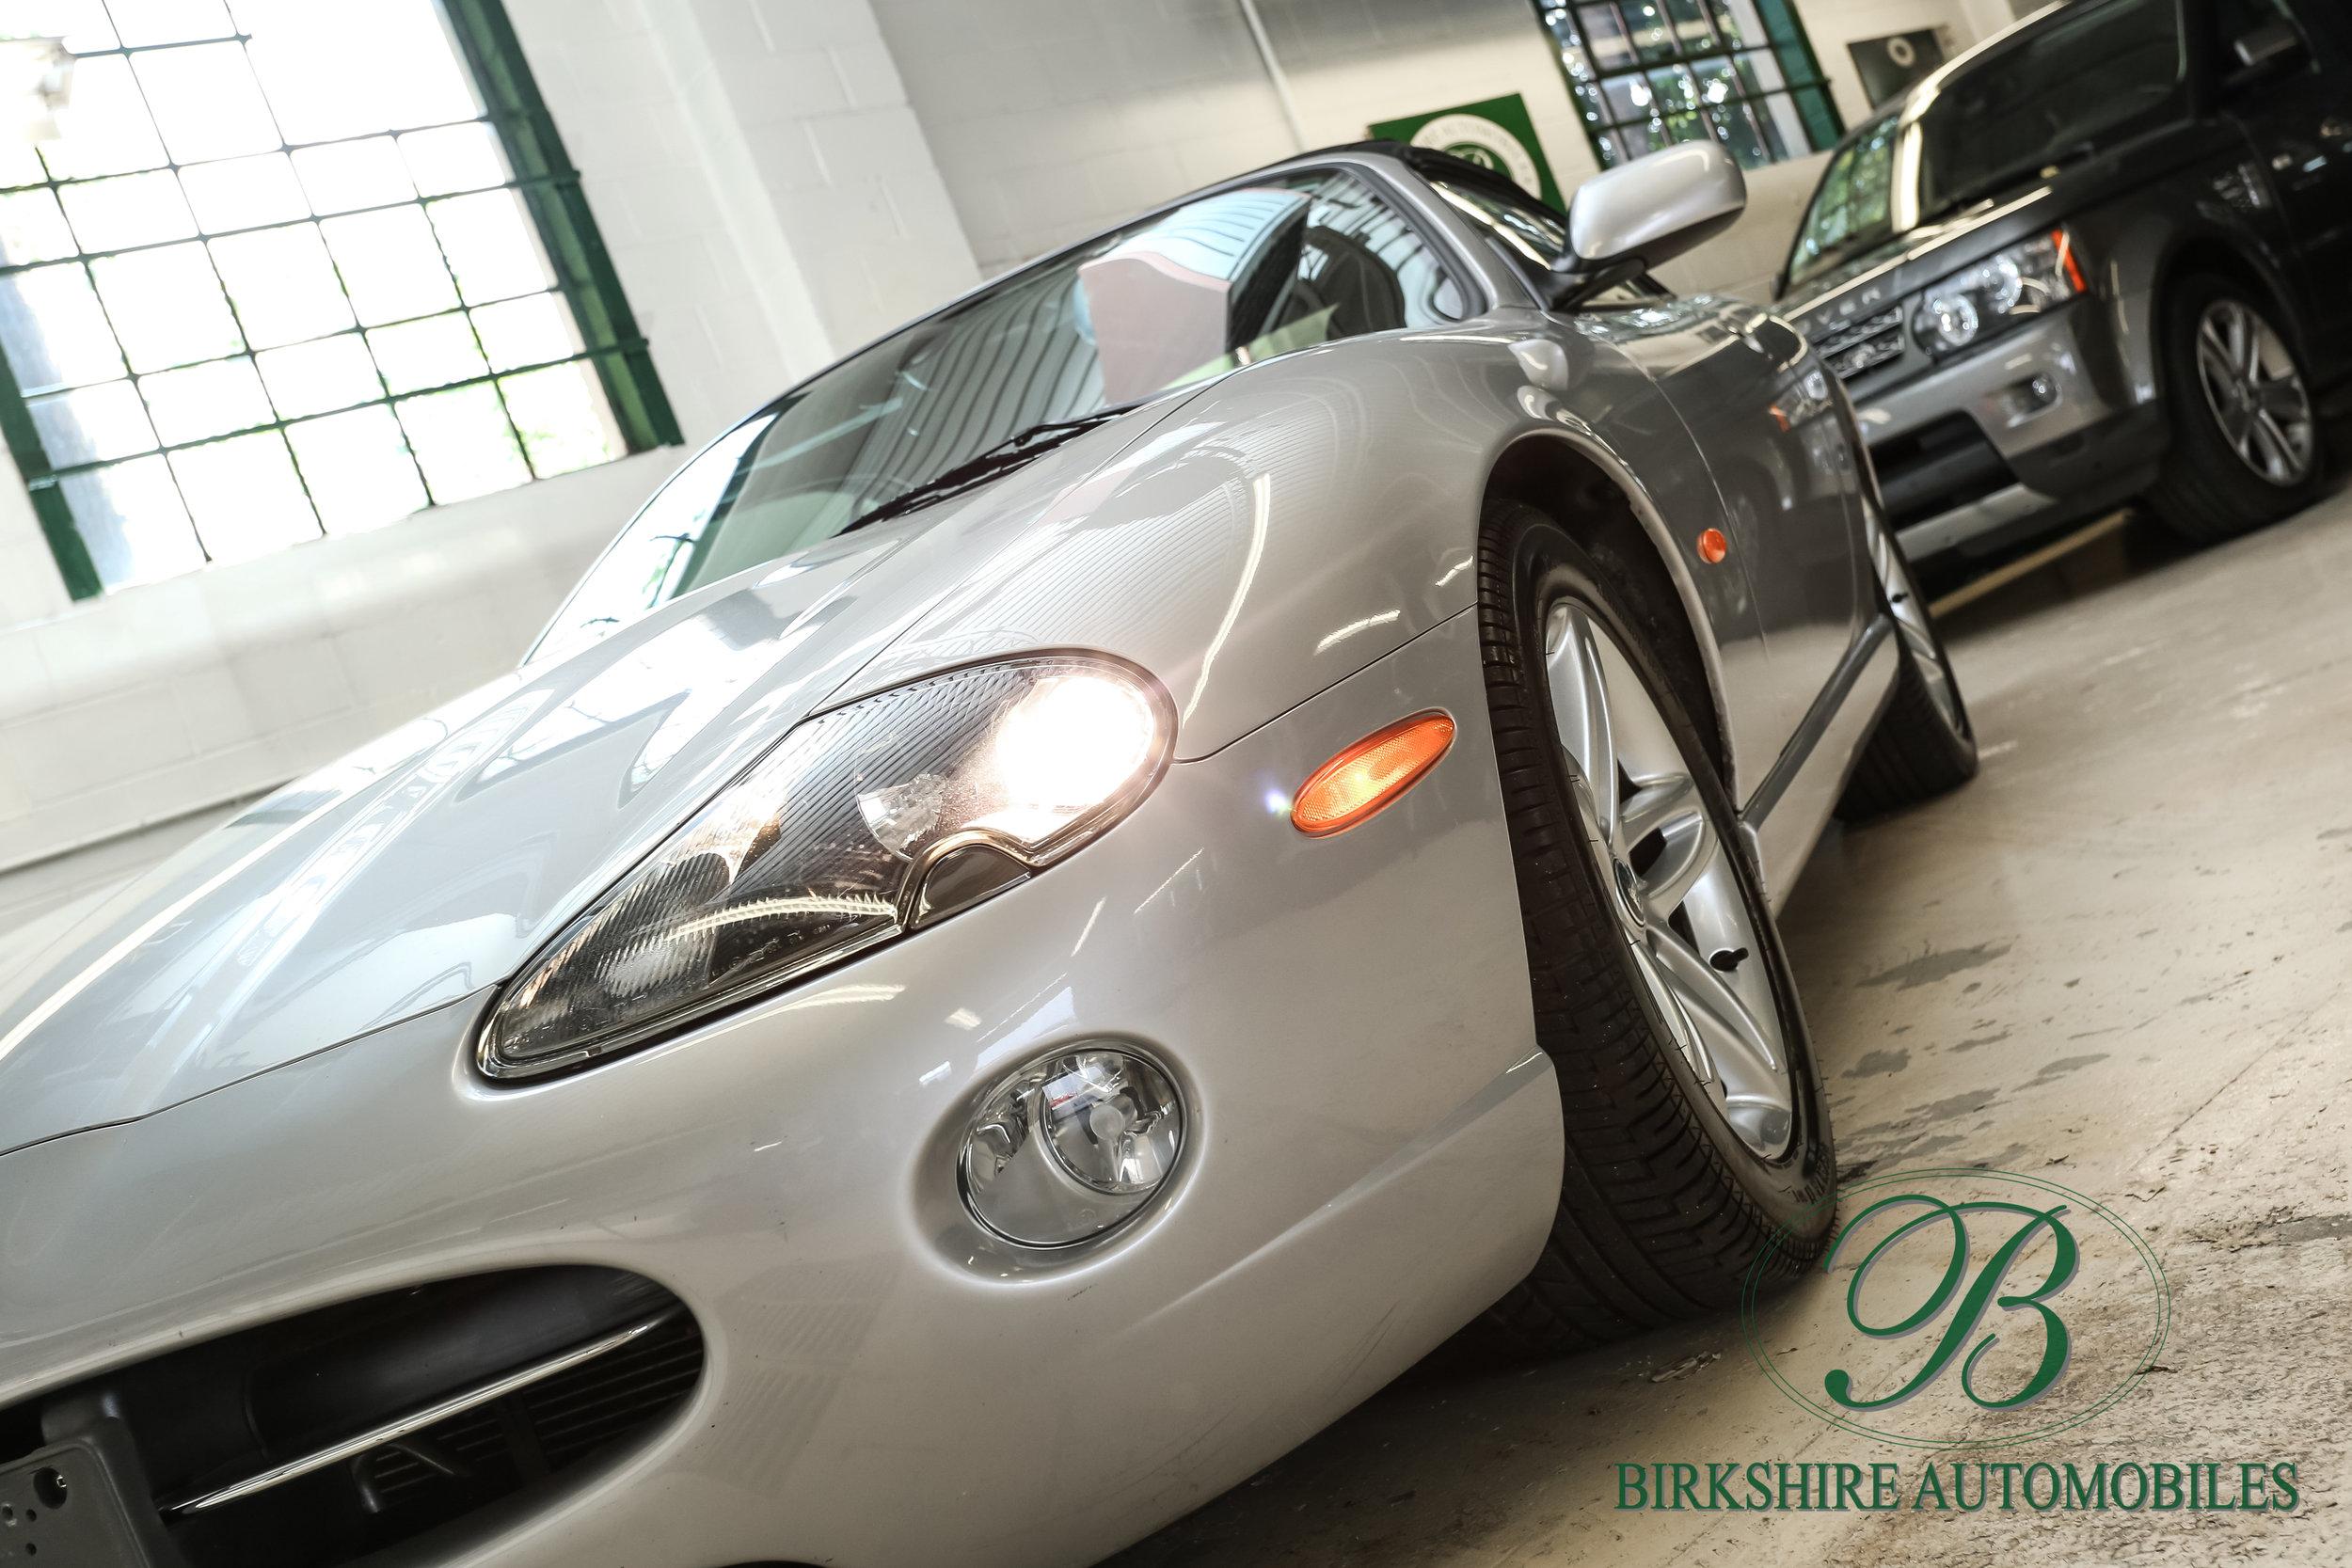 Birkshire Automobiles-214.jpg